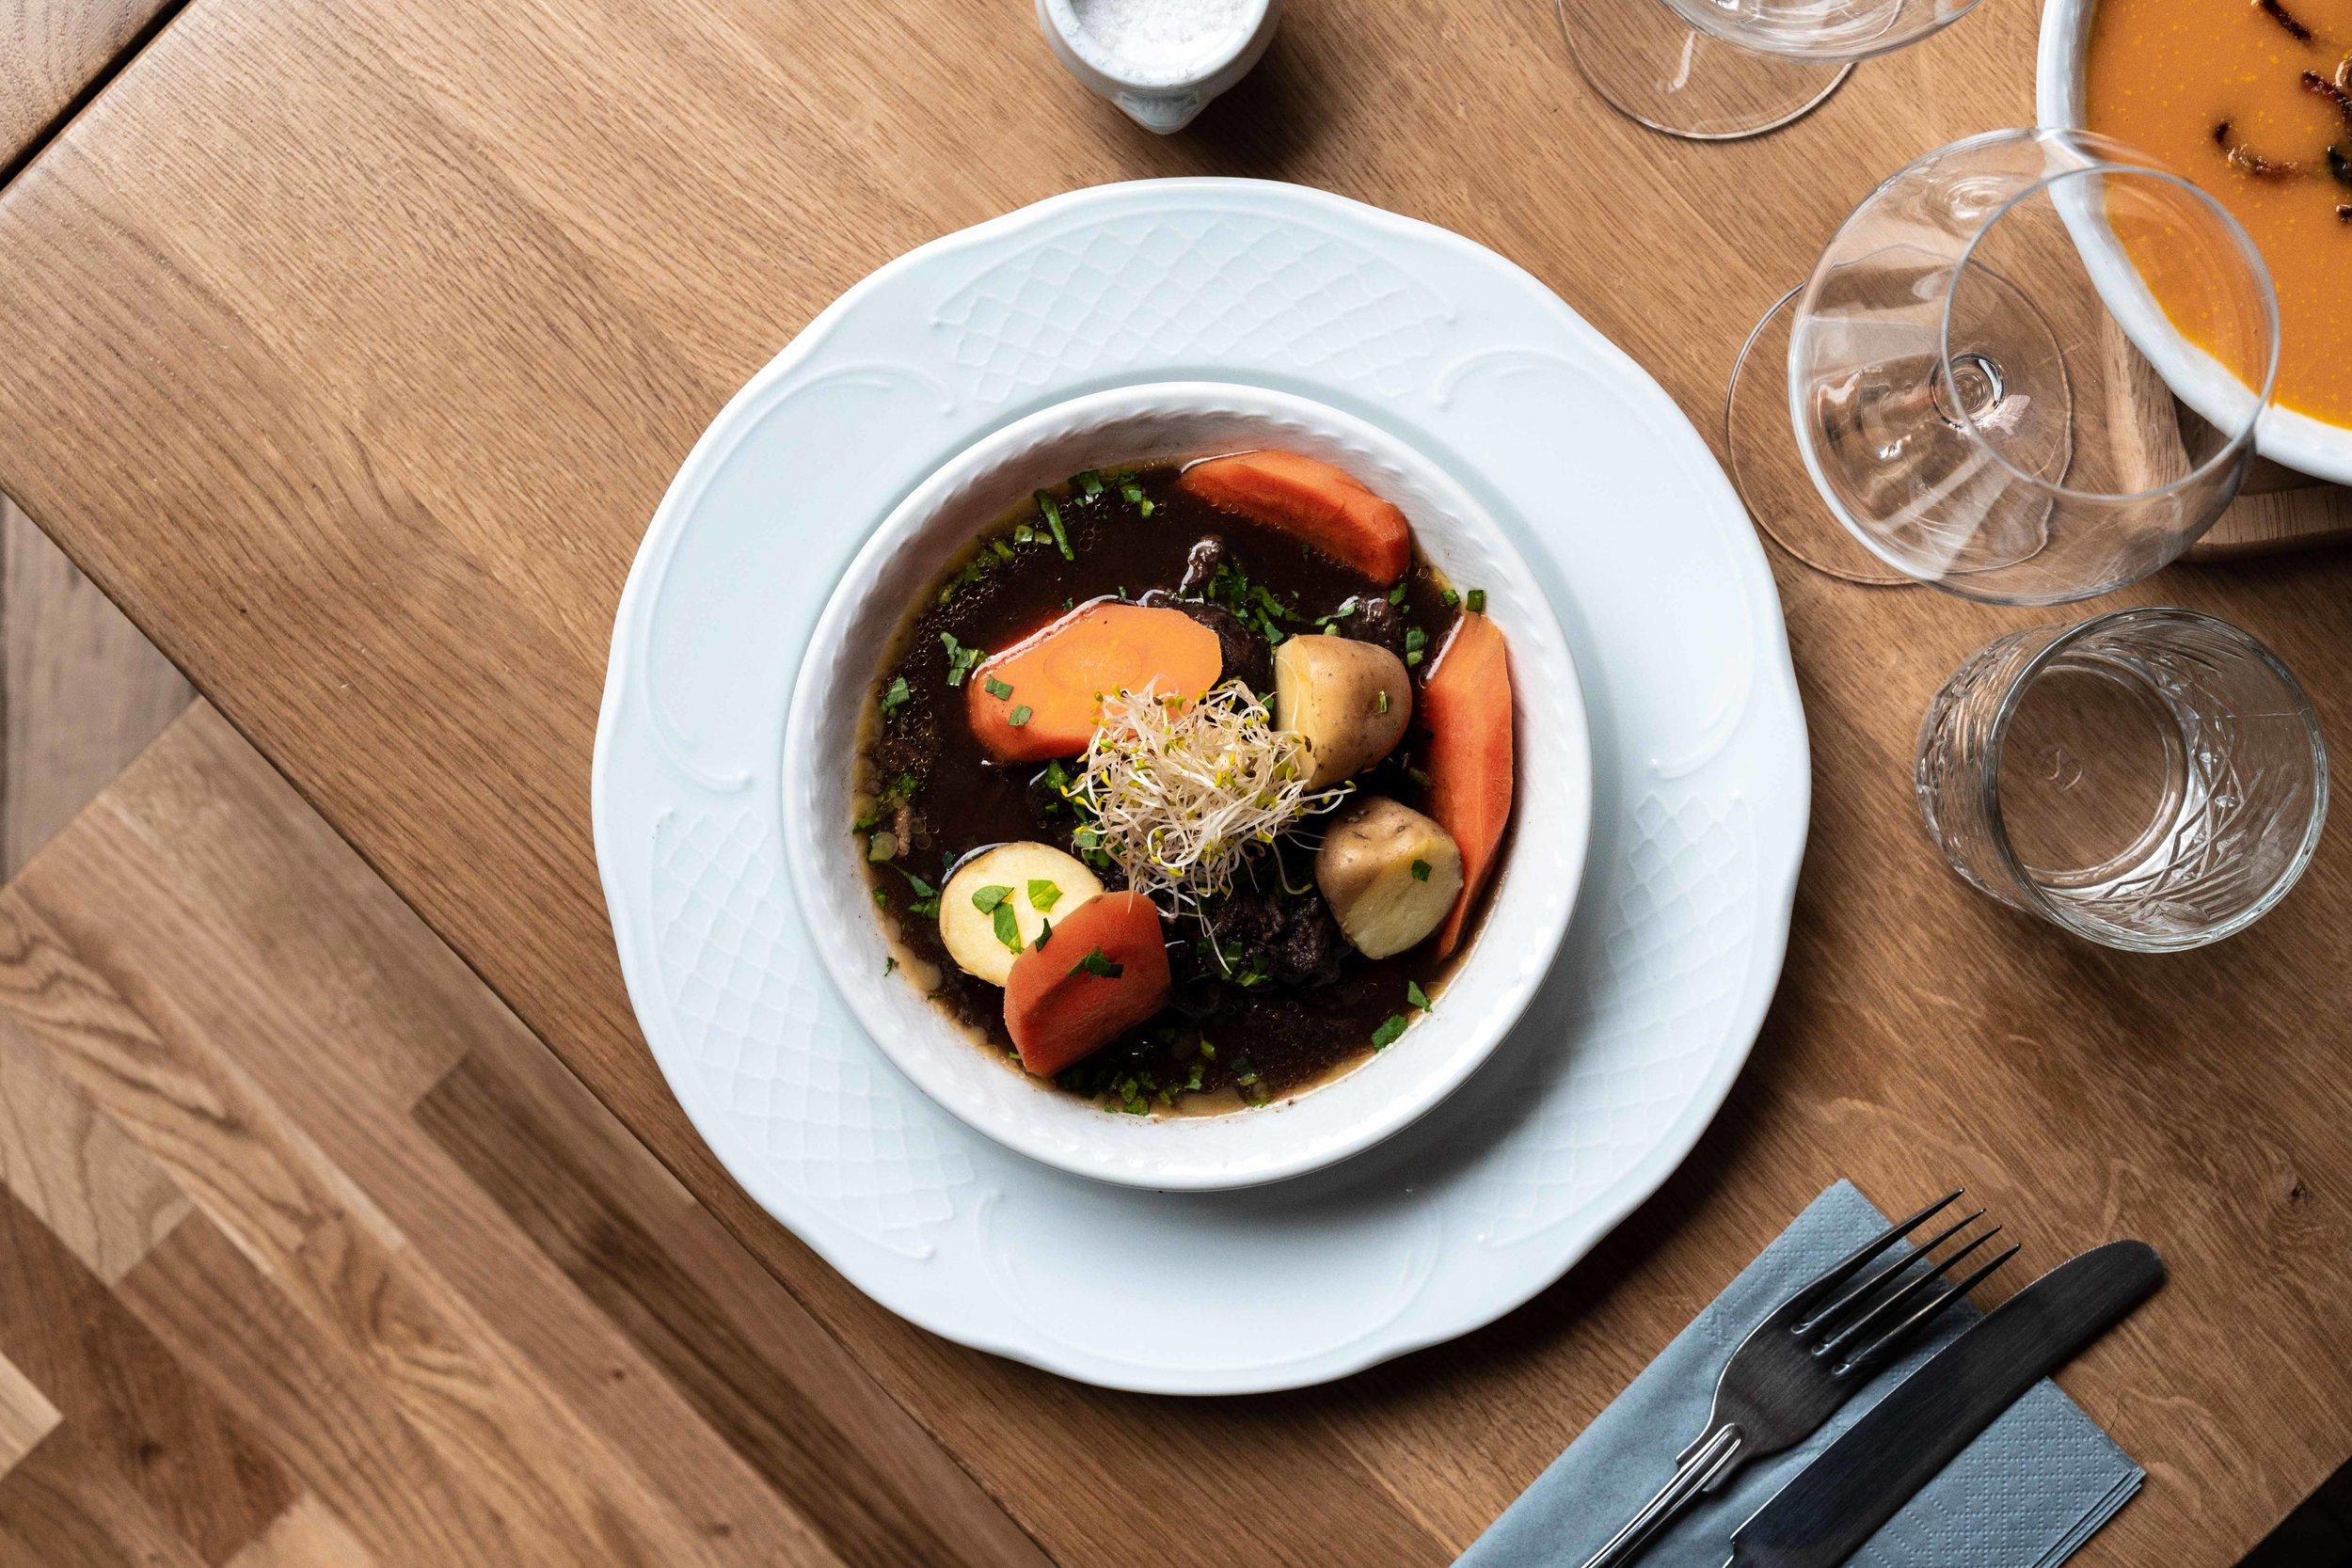 Jacques_Restaurant_by©Edouard_Auffray-Benjamin_Konrad Food 2-2-4.JPG